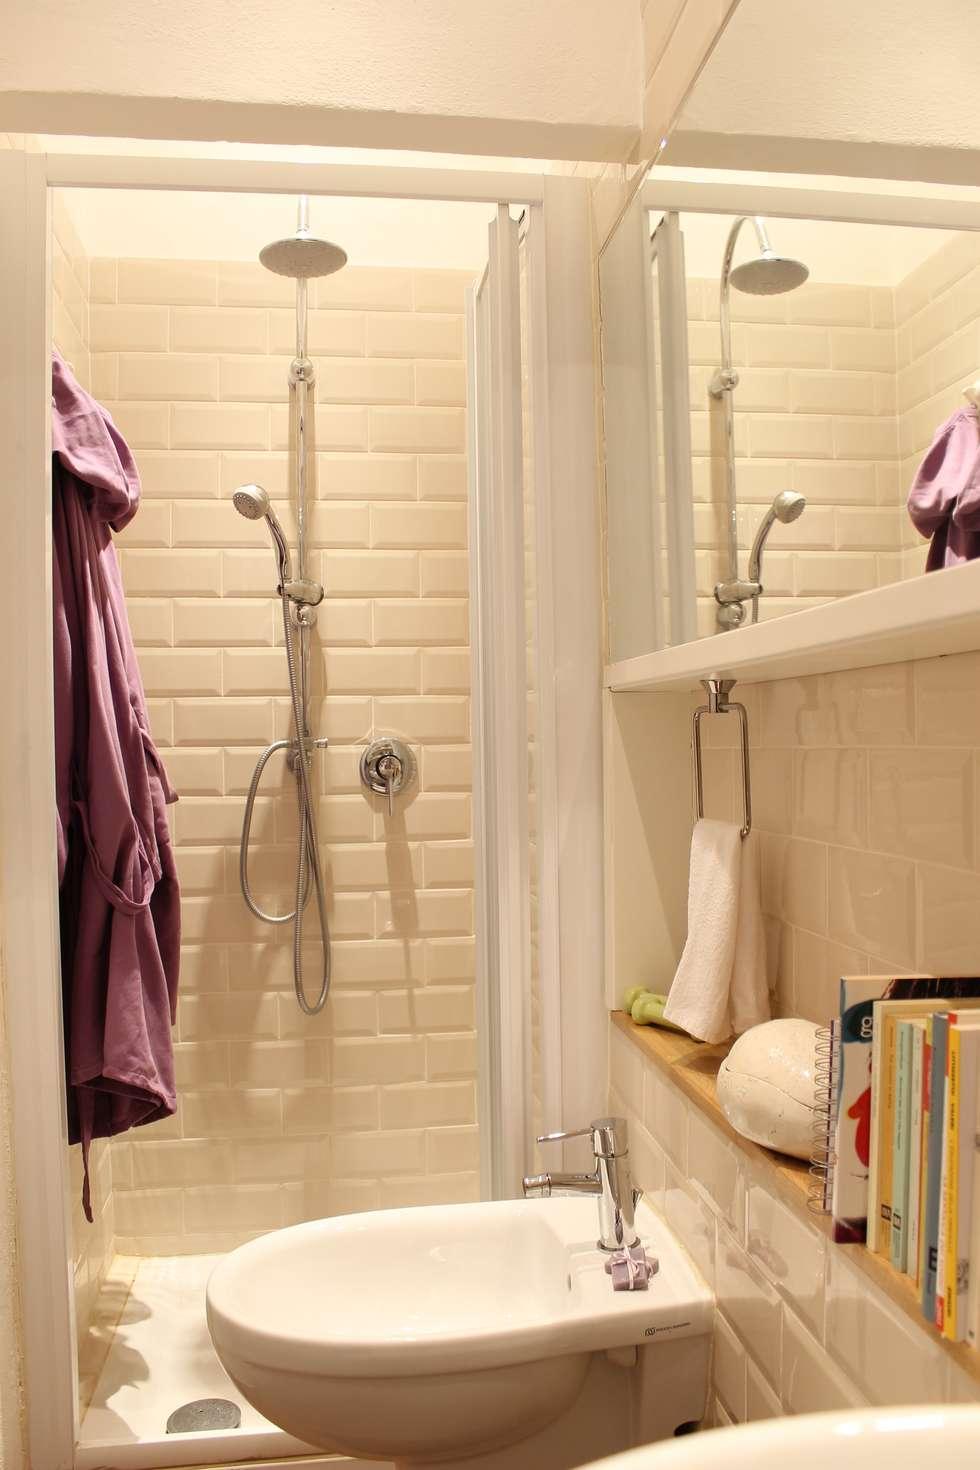 Arch. Silvana Citterioが手掛けた浴室